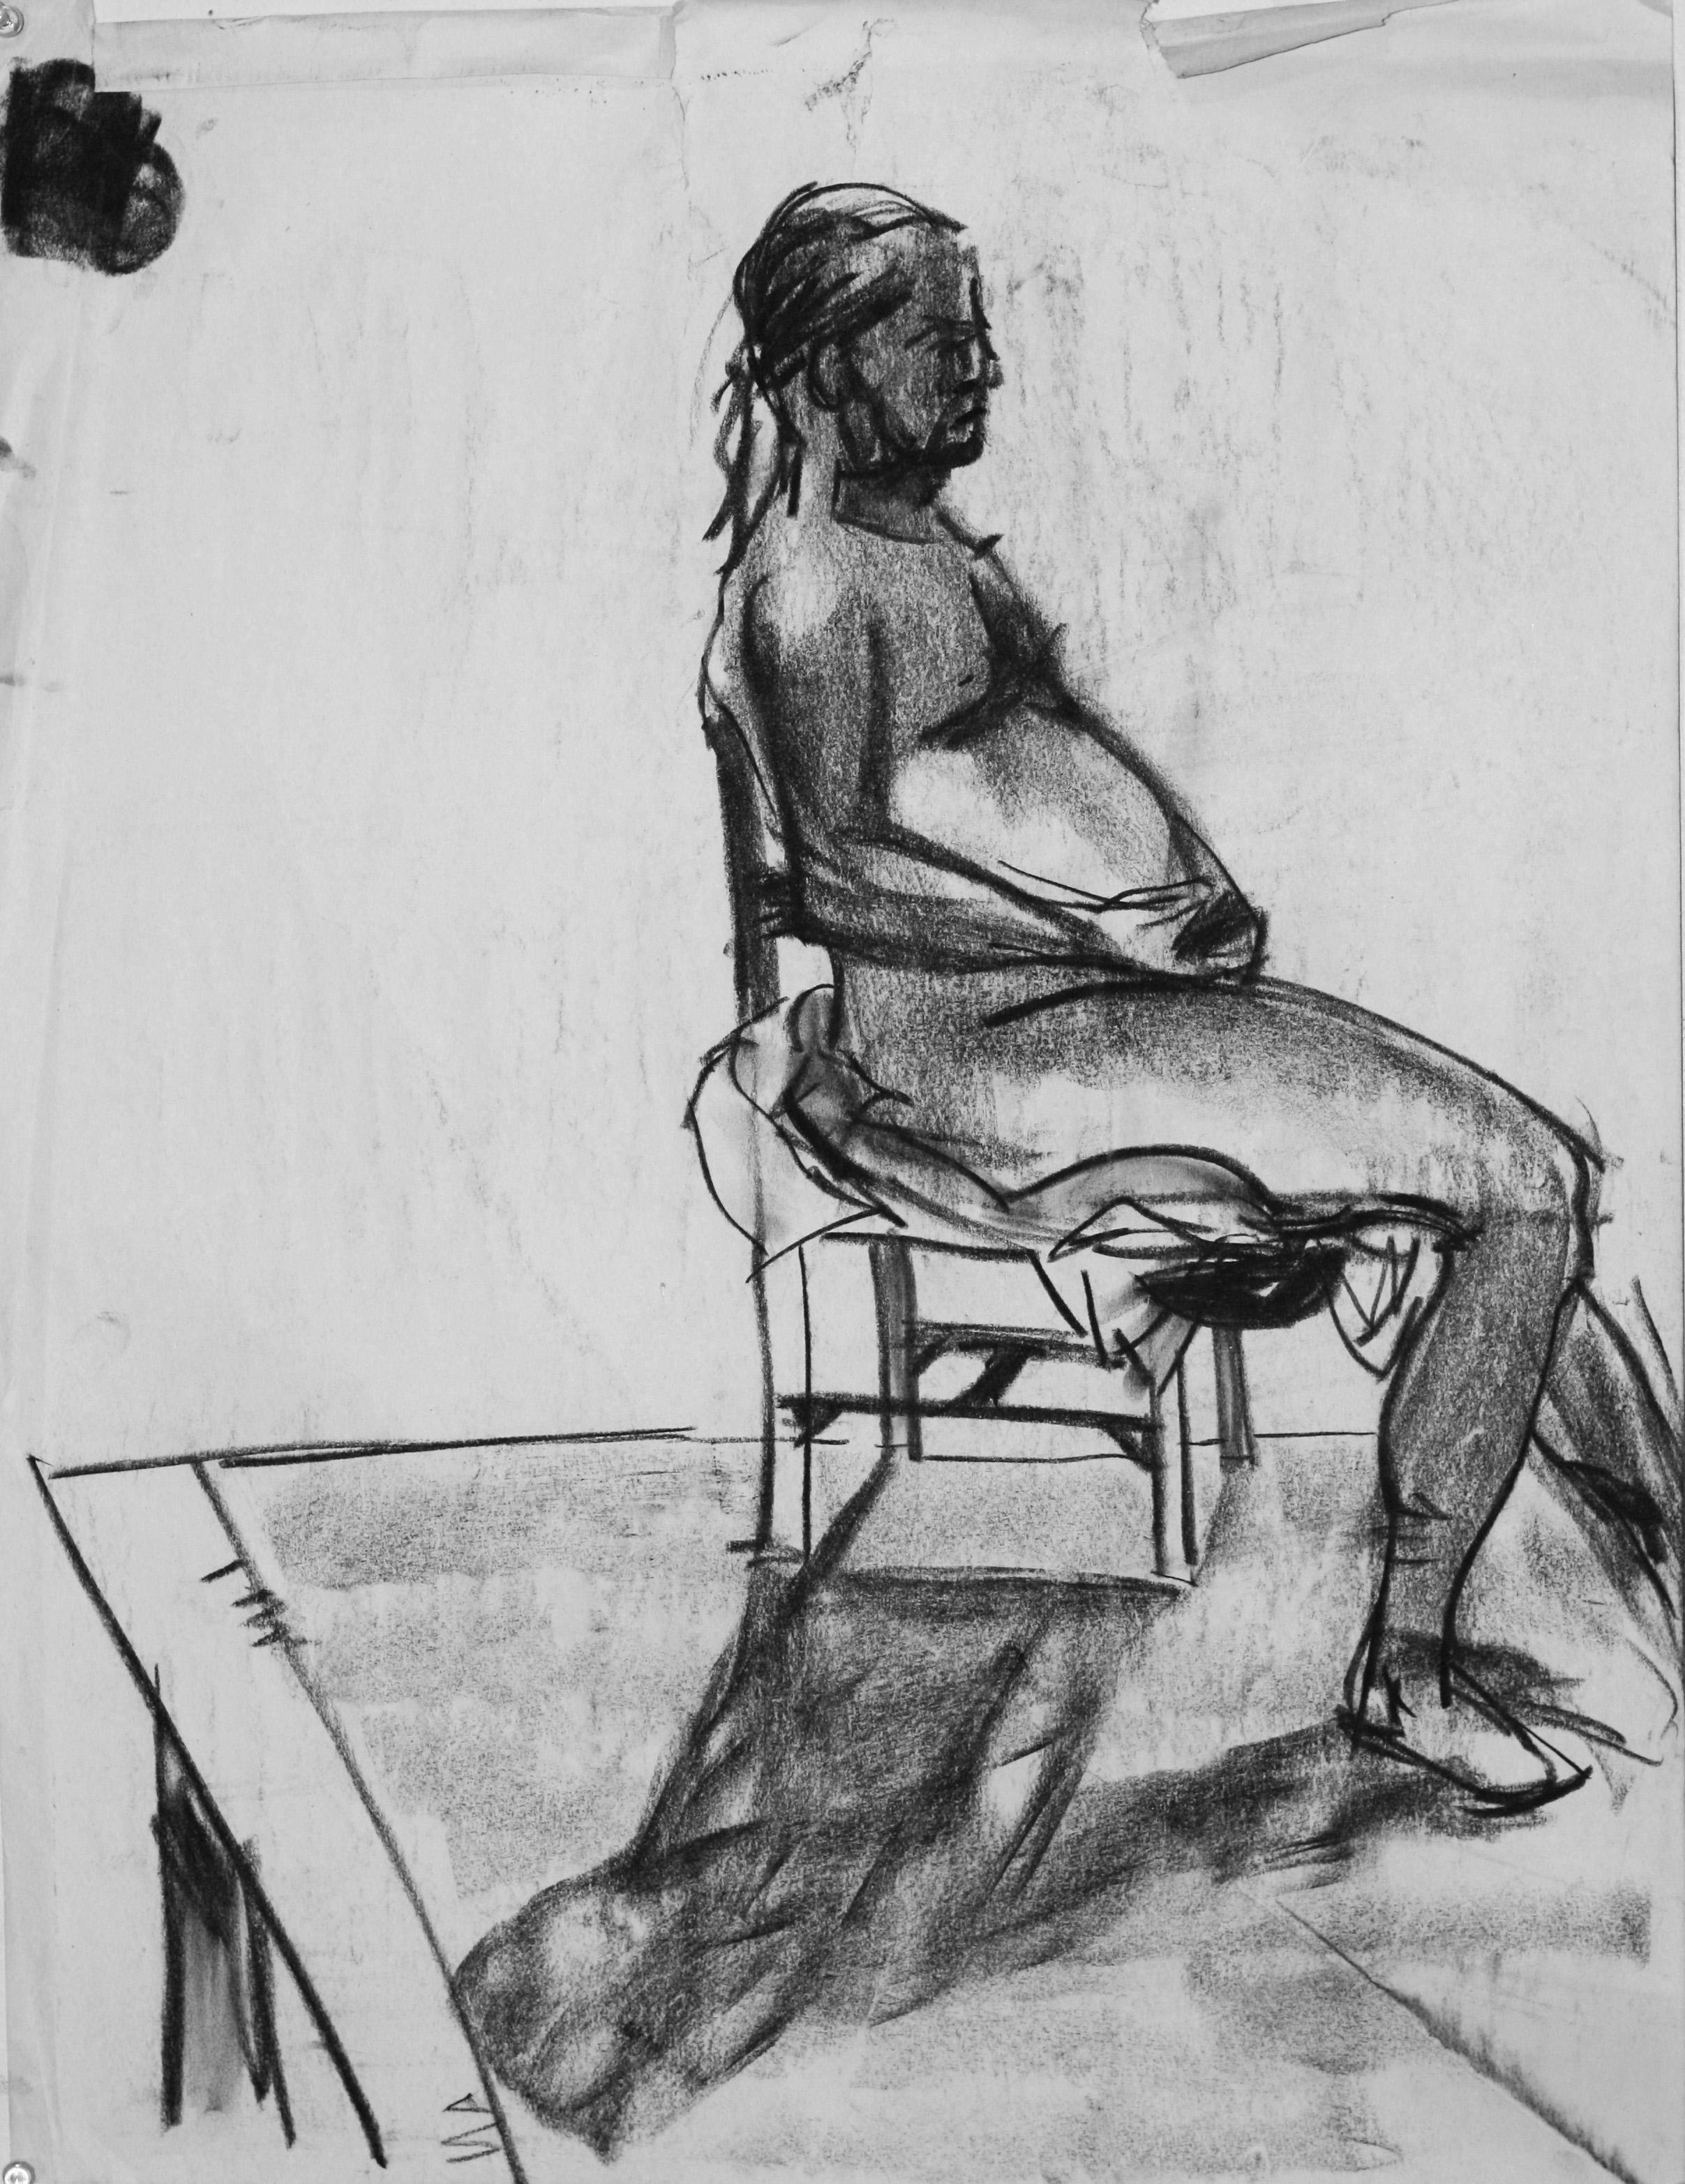 sittingfigure study2013.jpg